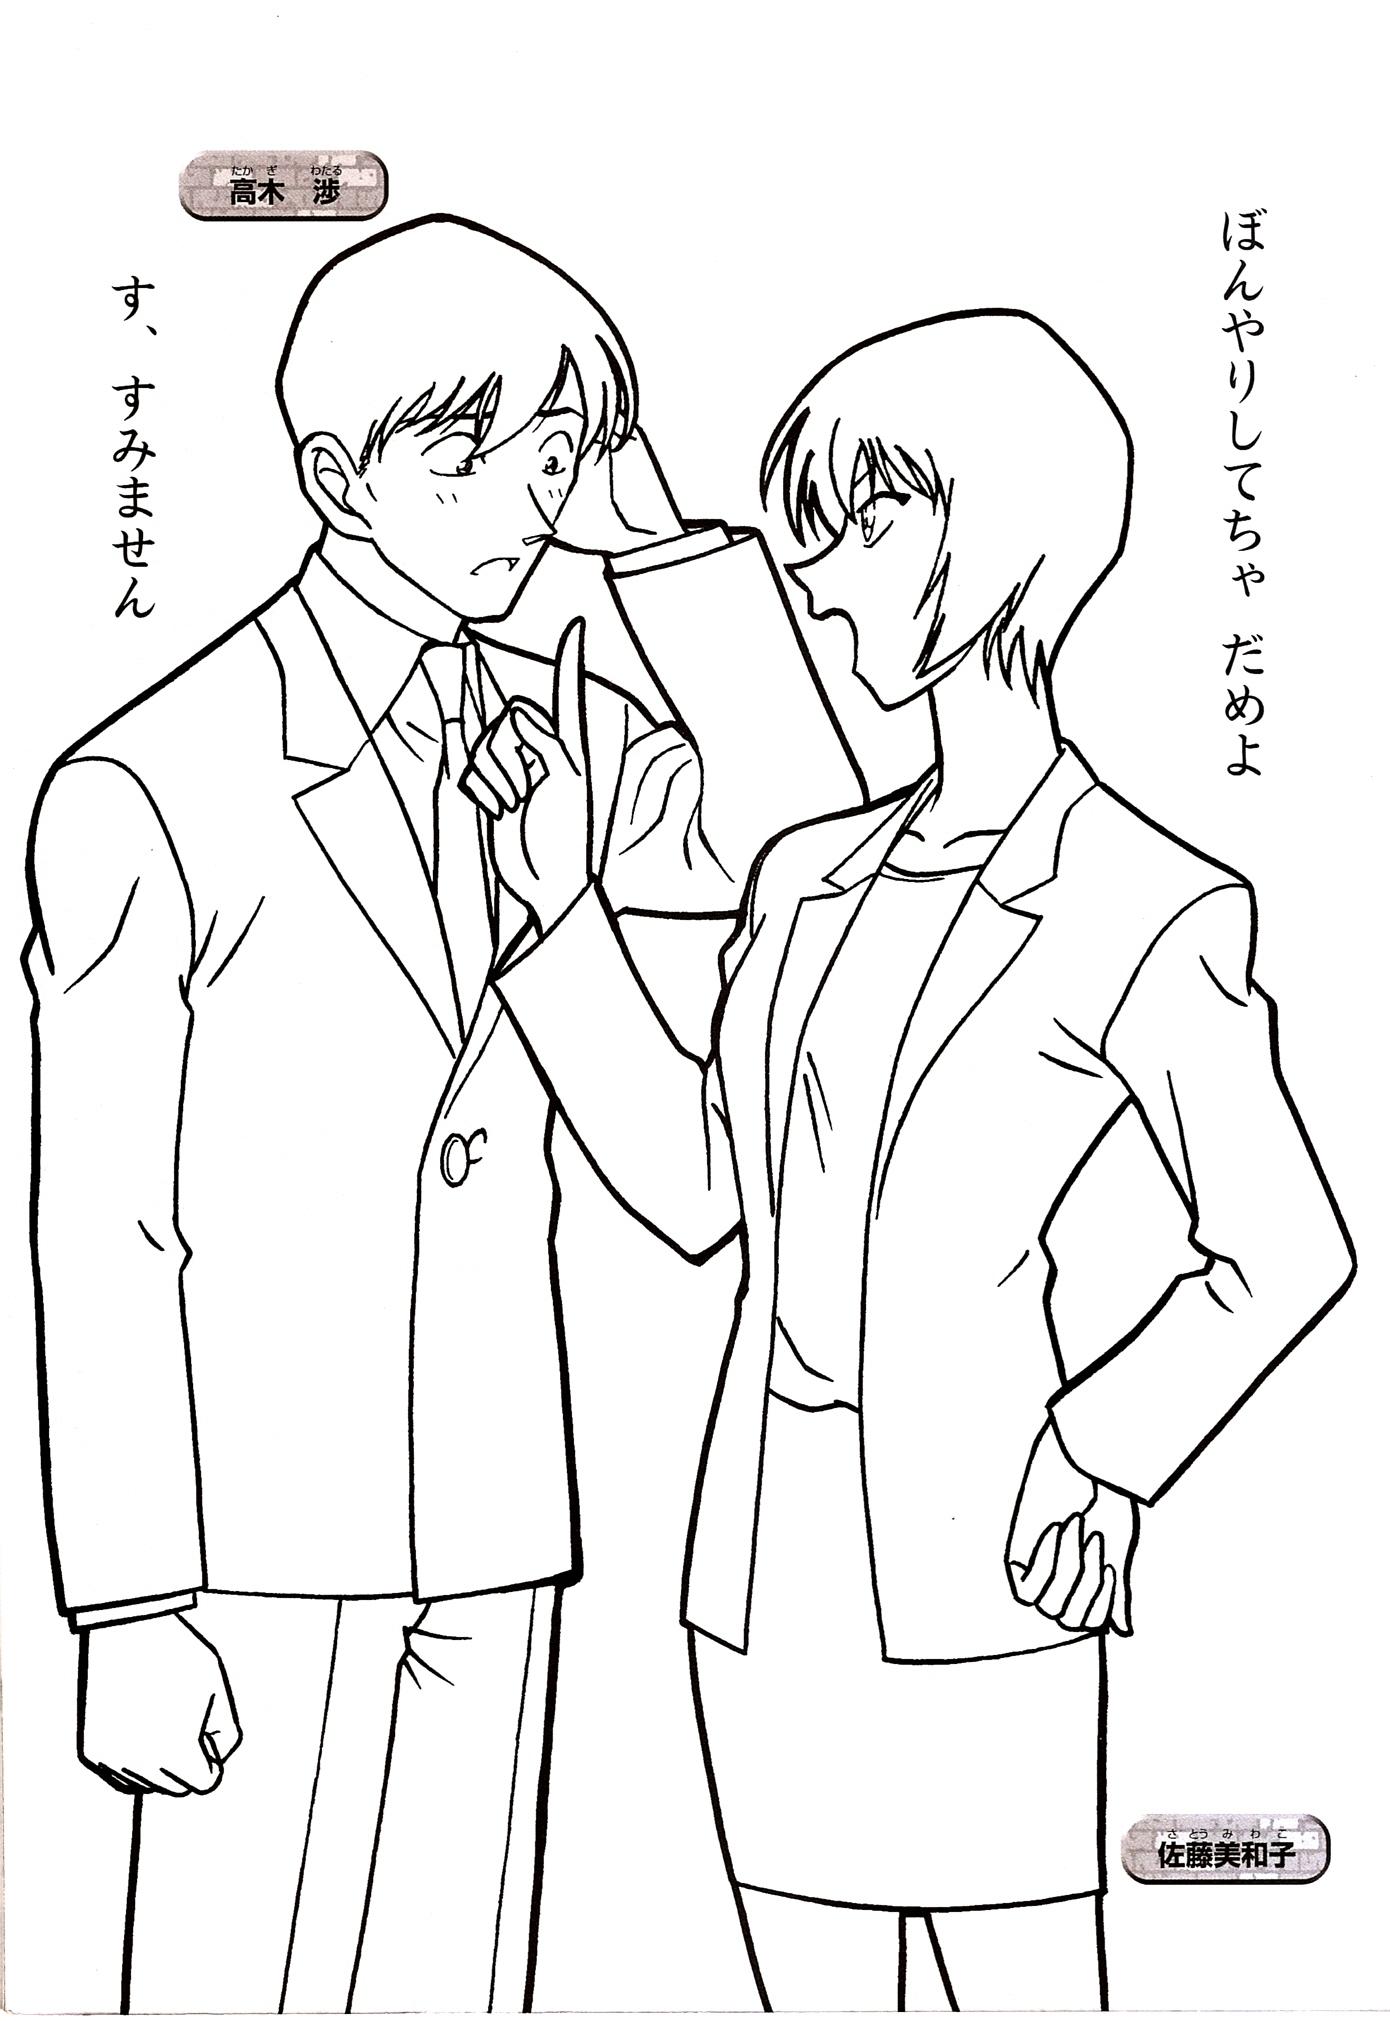 Coloring book - Detective Conan